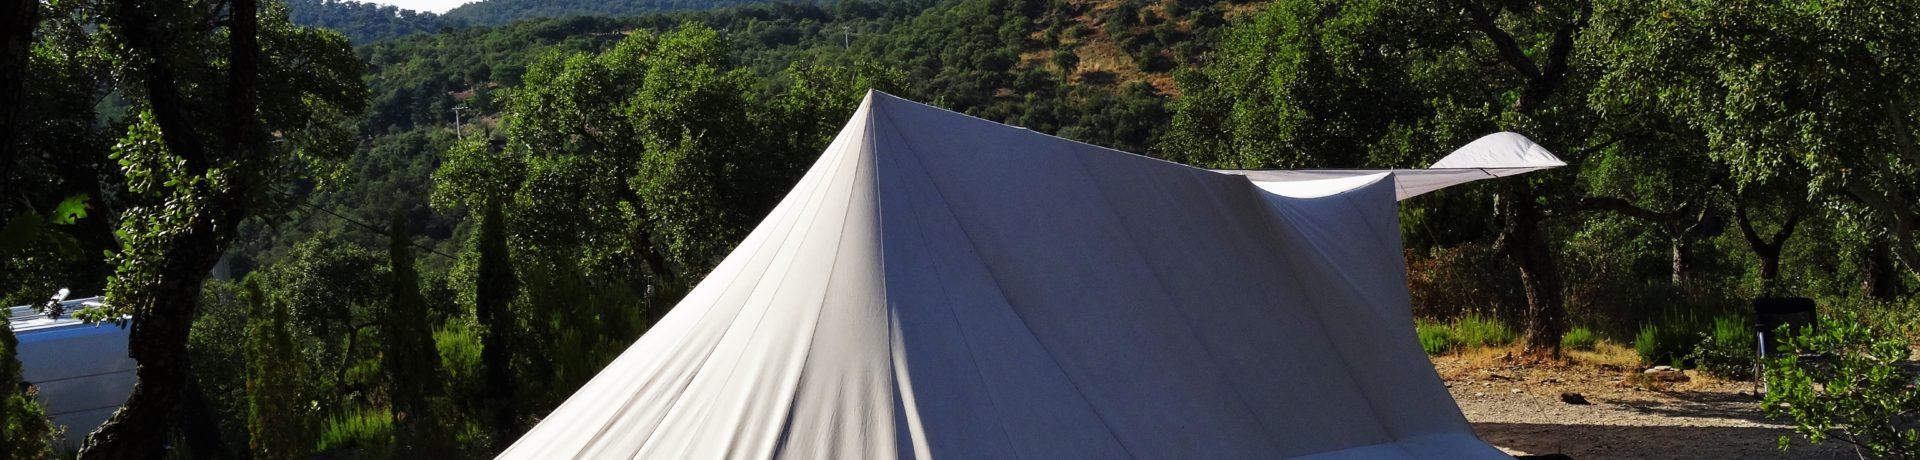 Camping Al Comu in Llauro is een mooie charme camping gelegen in Pyrénées-Orientales in de regio Languedoc-Roussillon.